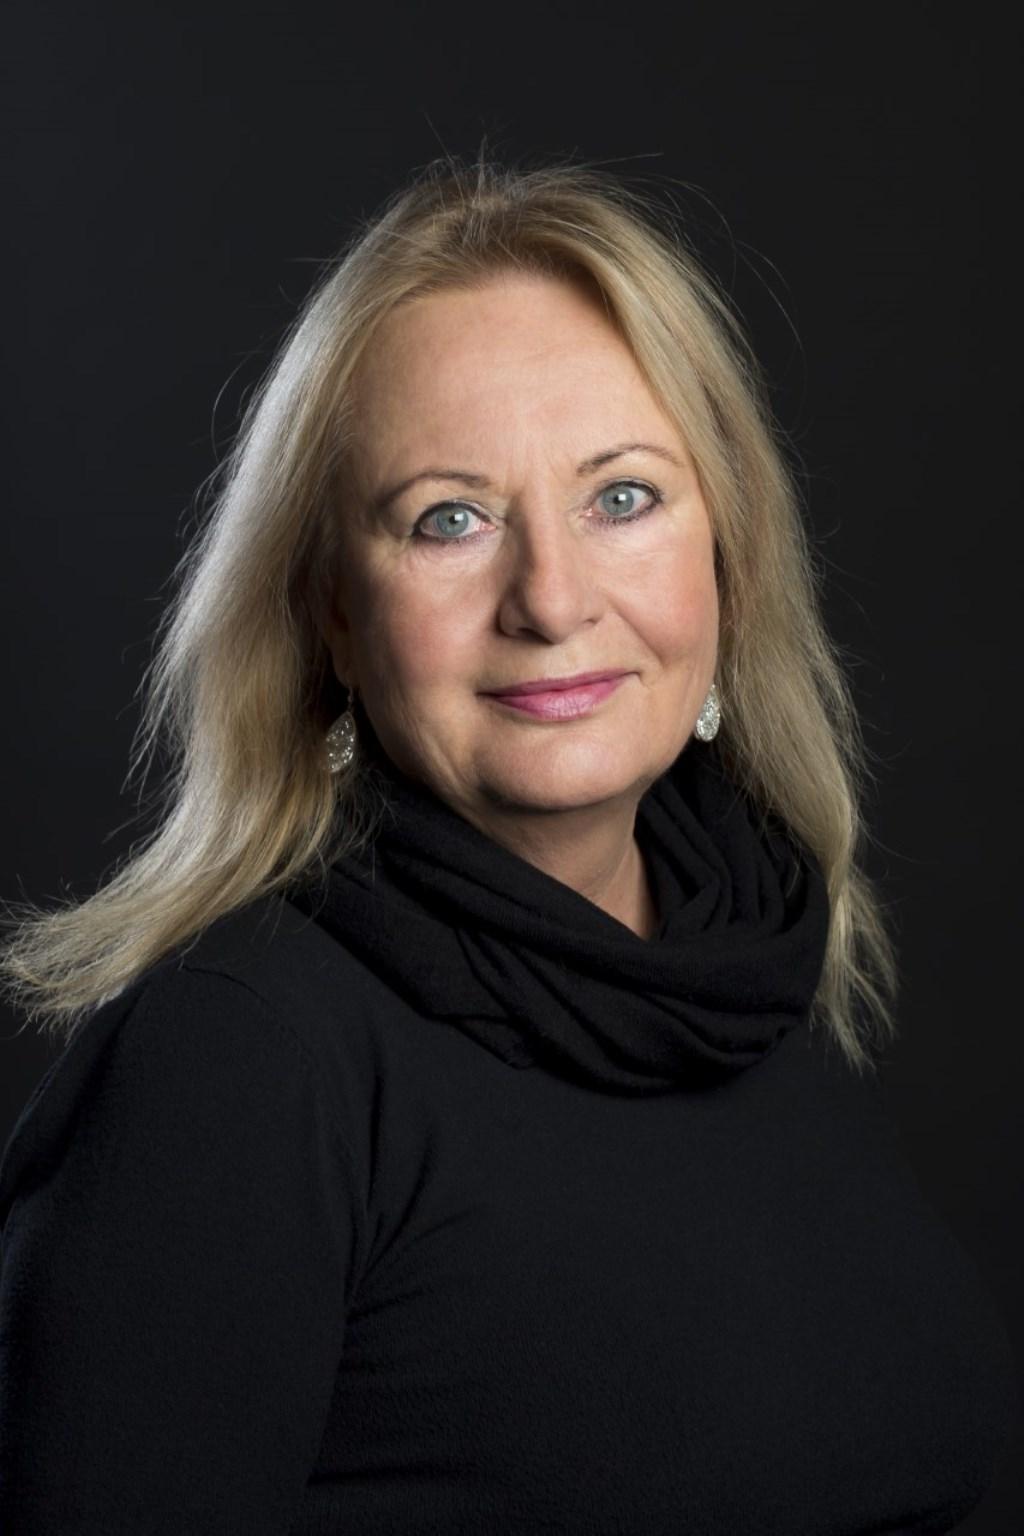 Rina Moorman. Yvonne van de Bergh © BDU Media